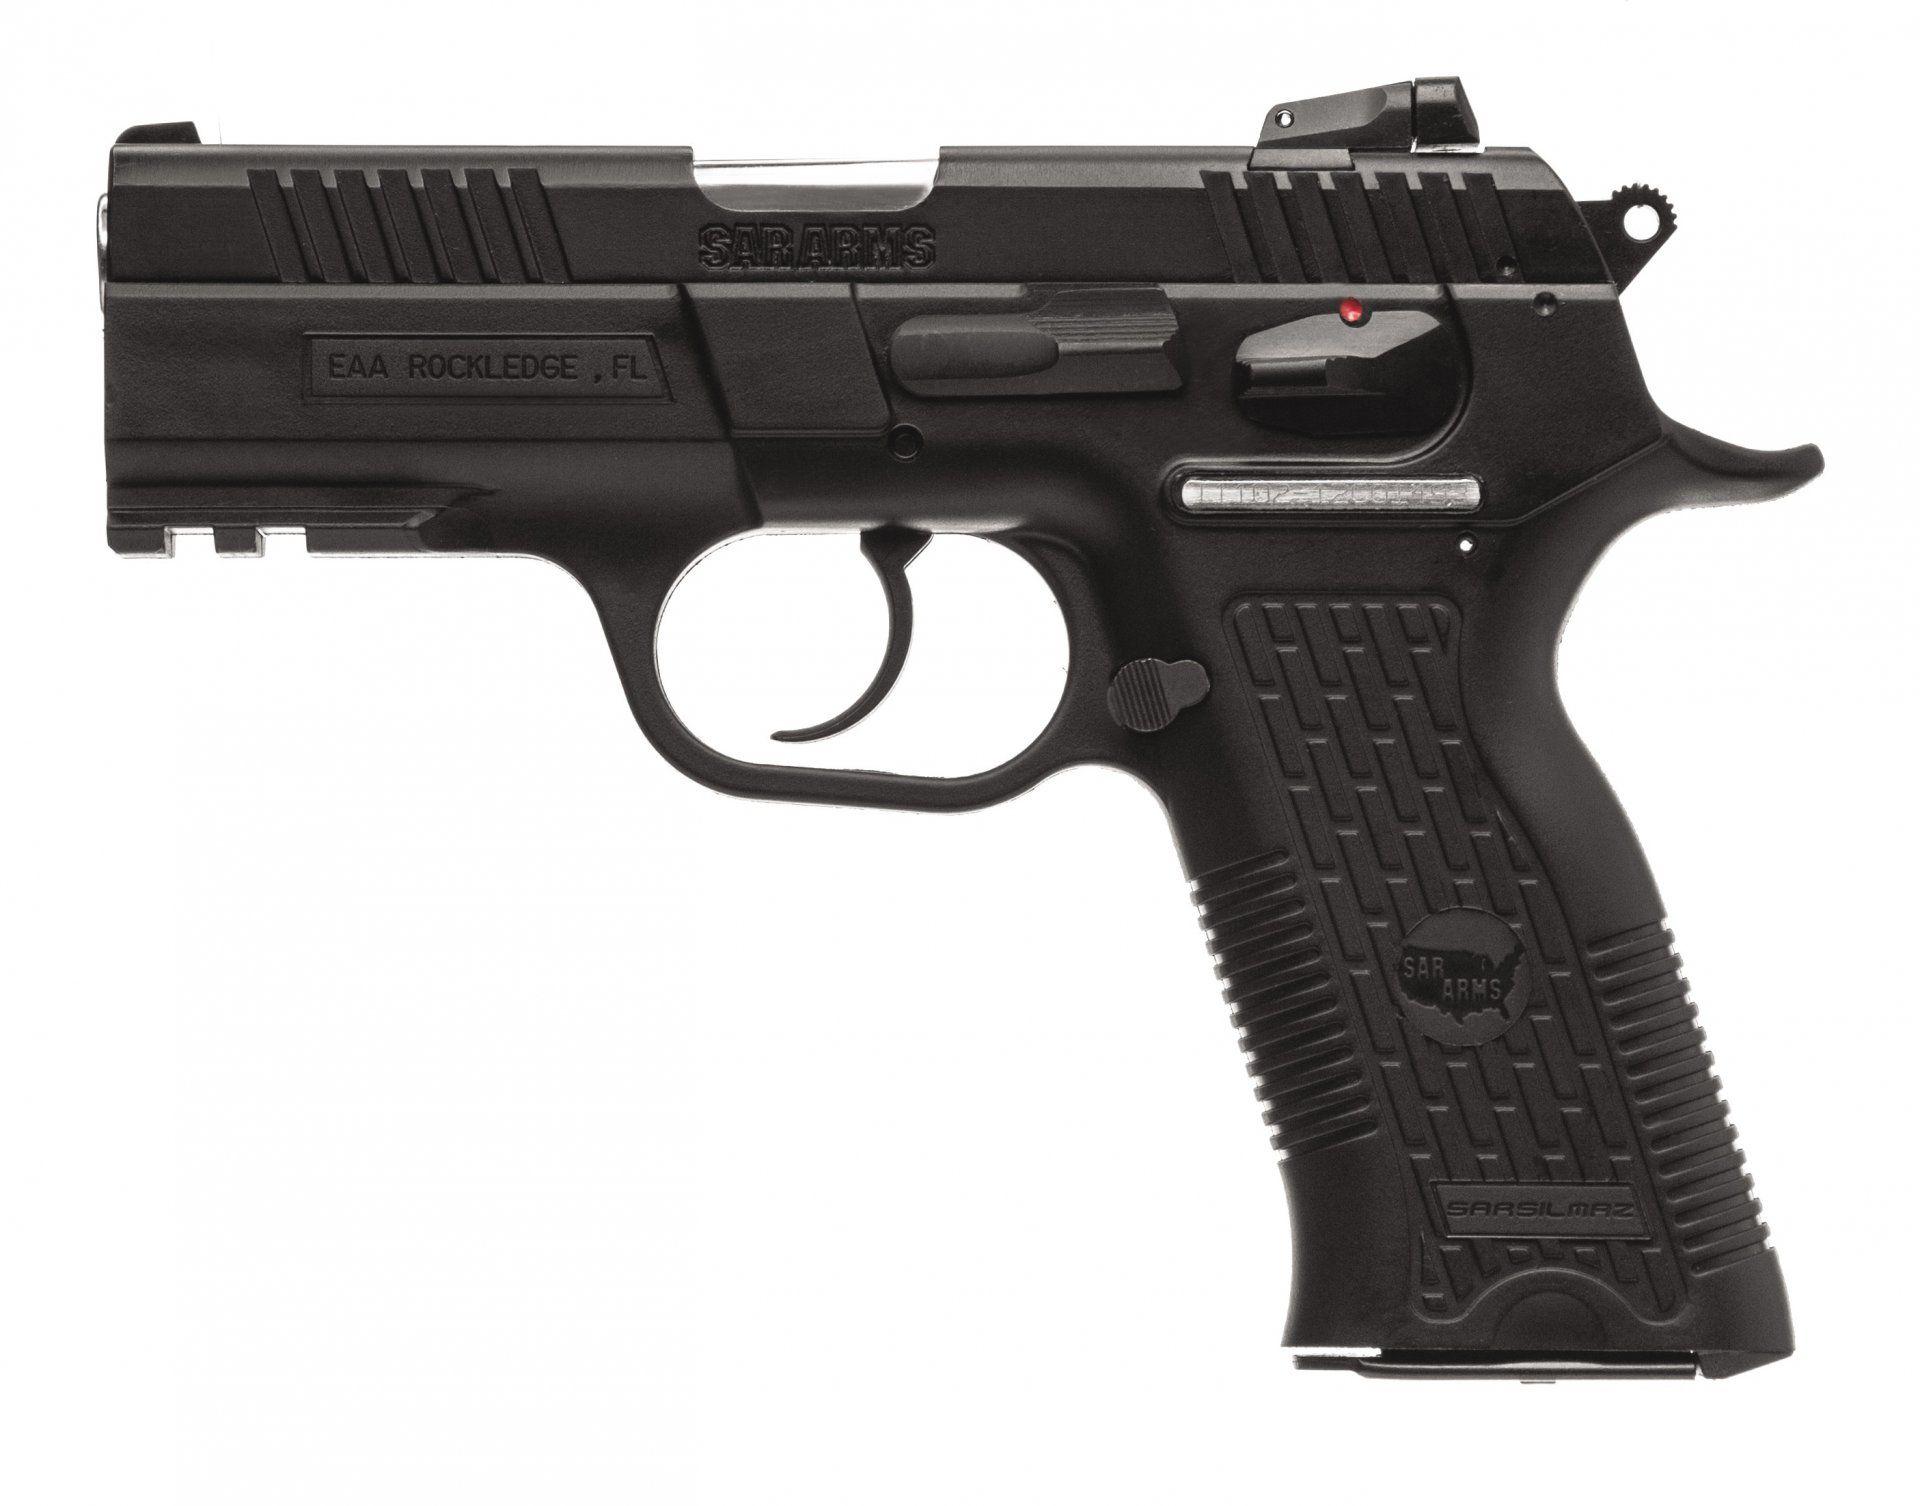 Ambi Safety! SAR K2P Semi Auto Pistol - Sarsilmaz Info from